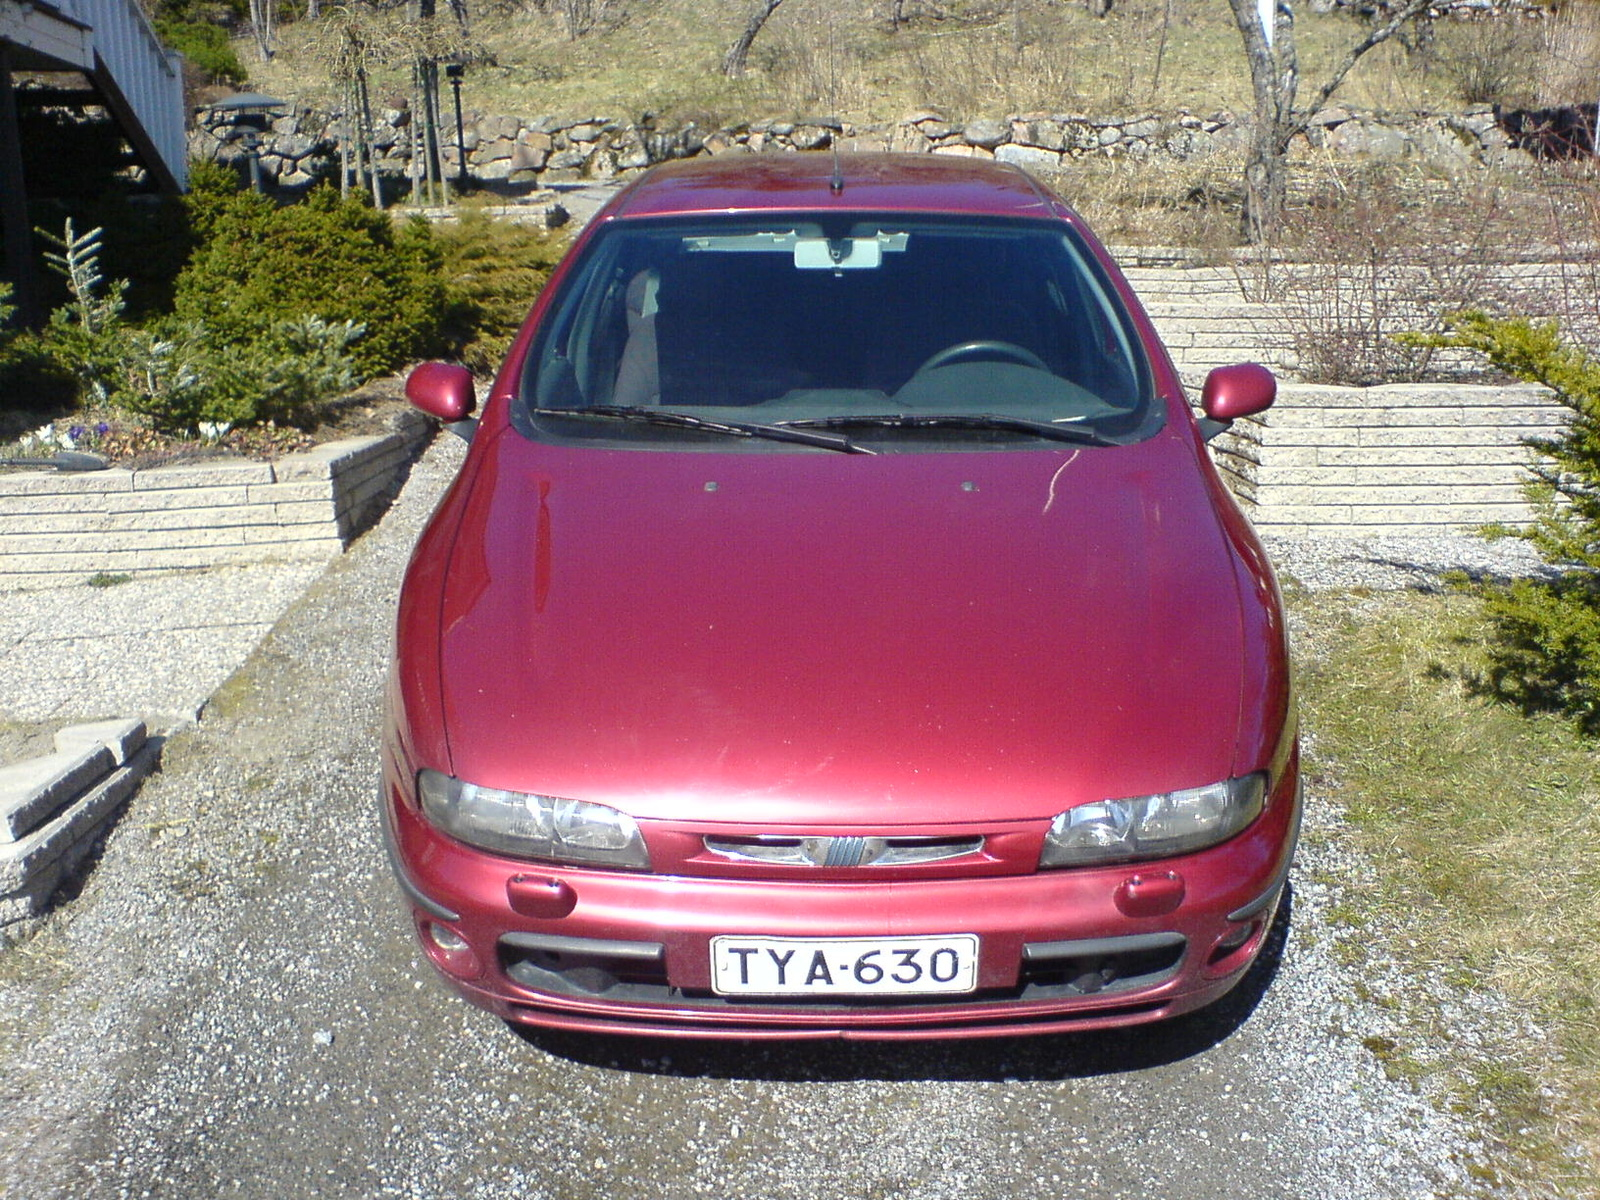 1999 Fiat Bravo